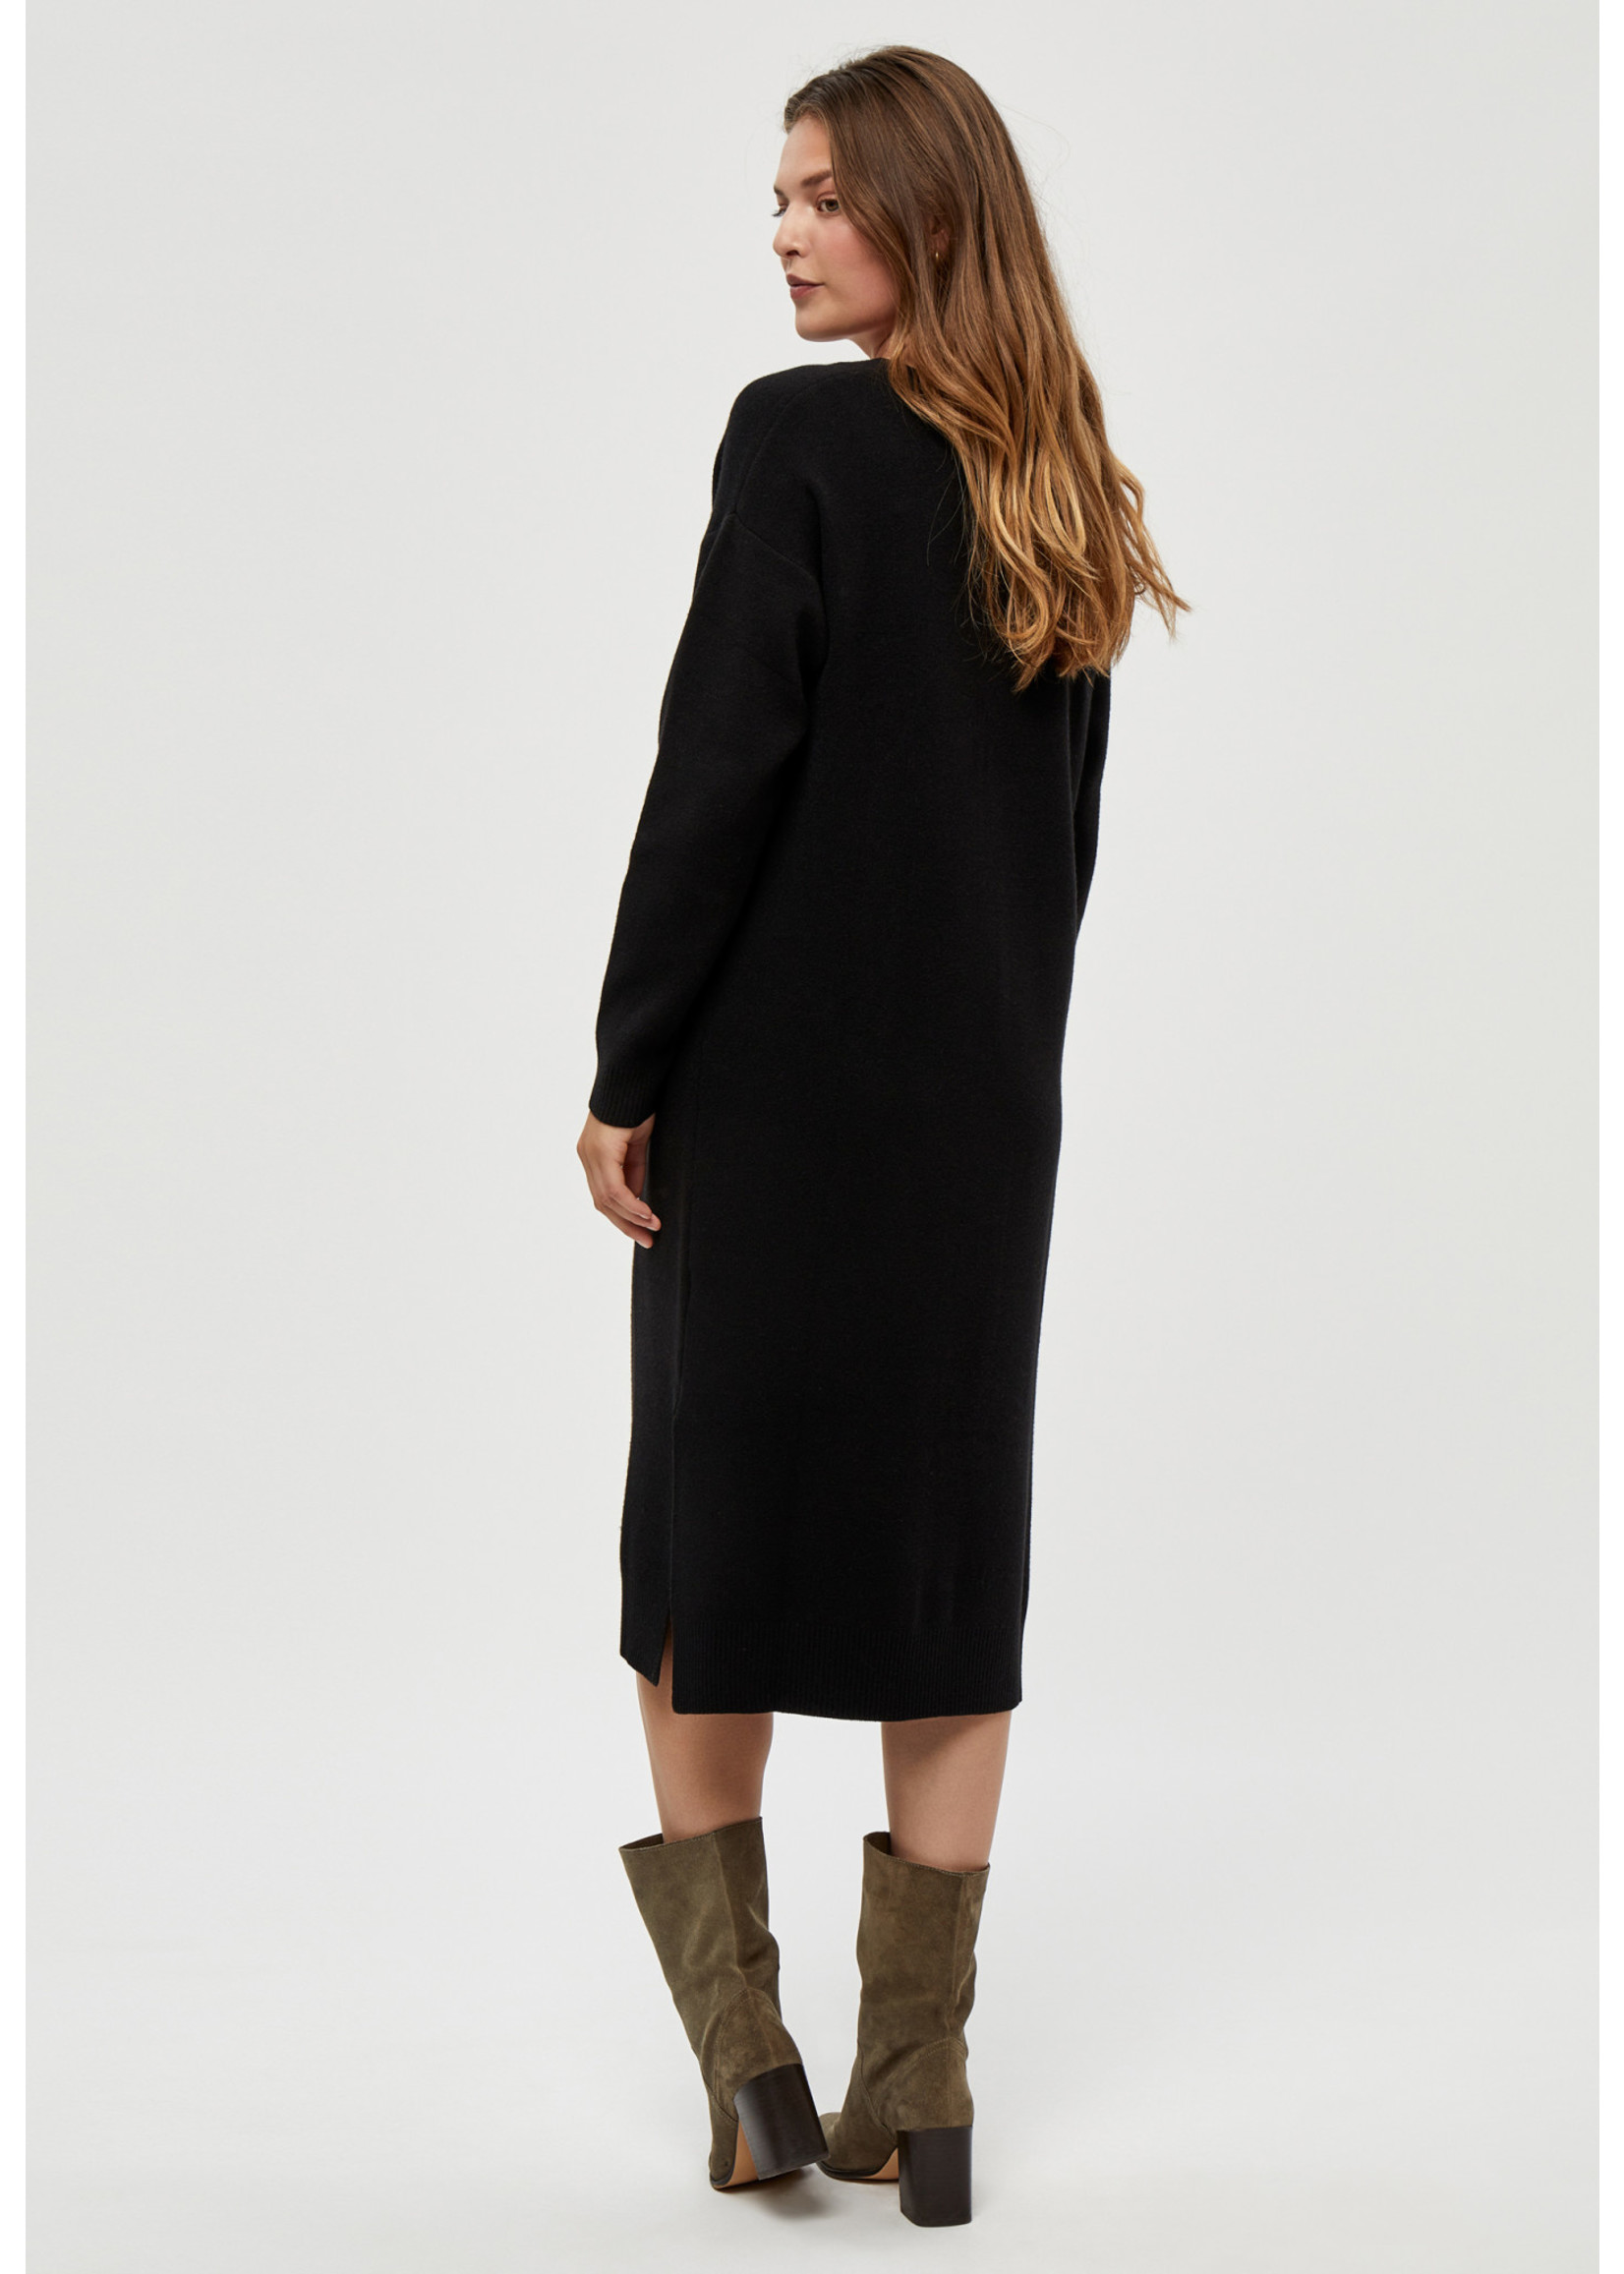 PEPPERCORN ROSALIA DRESS black